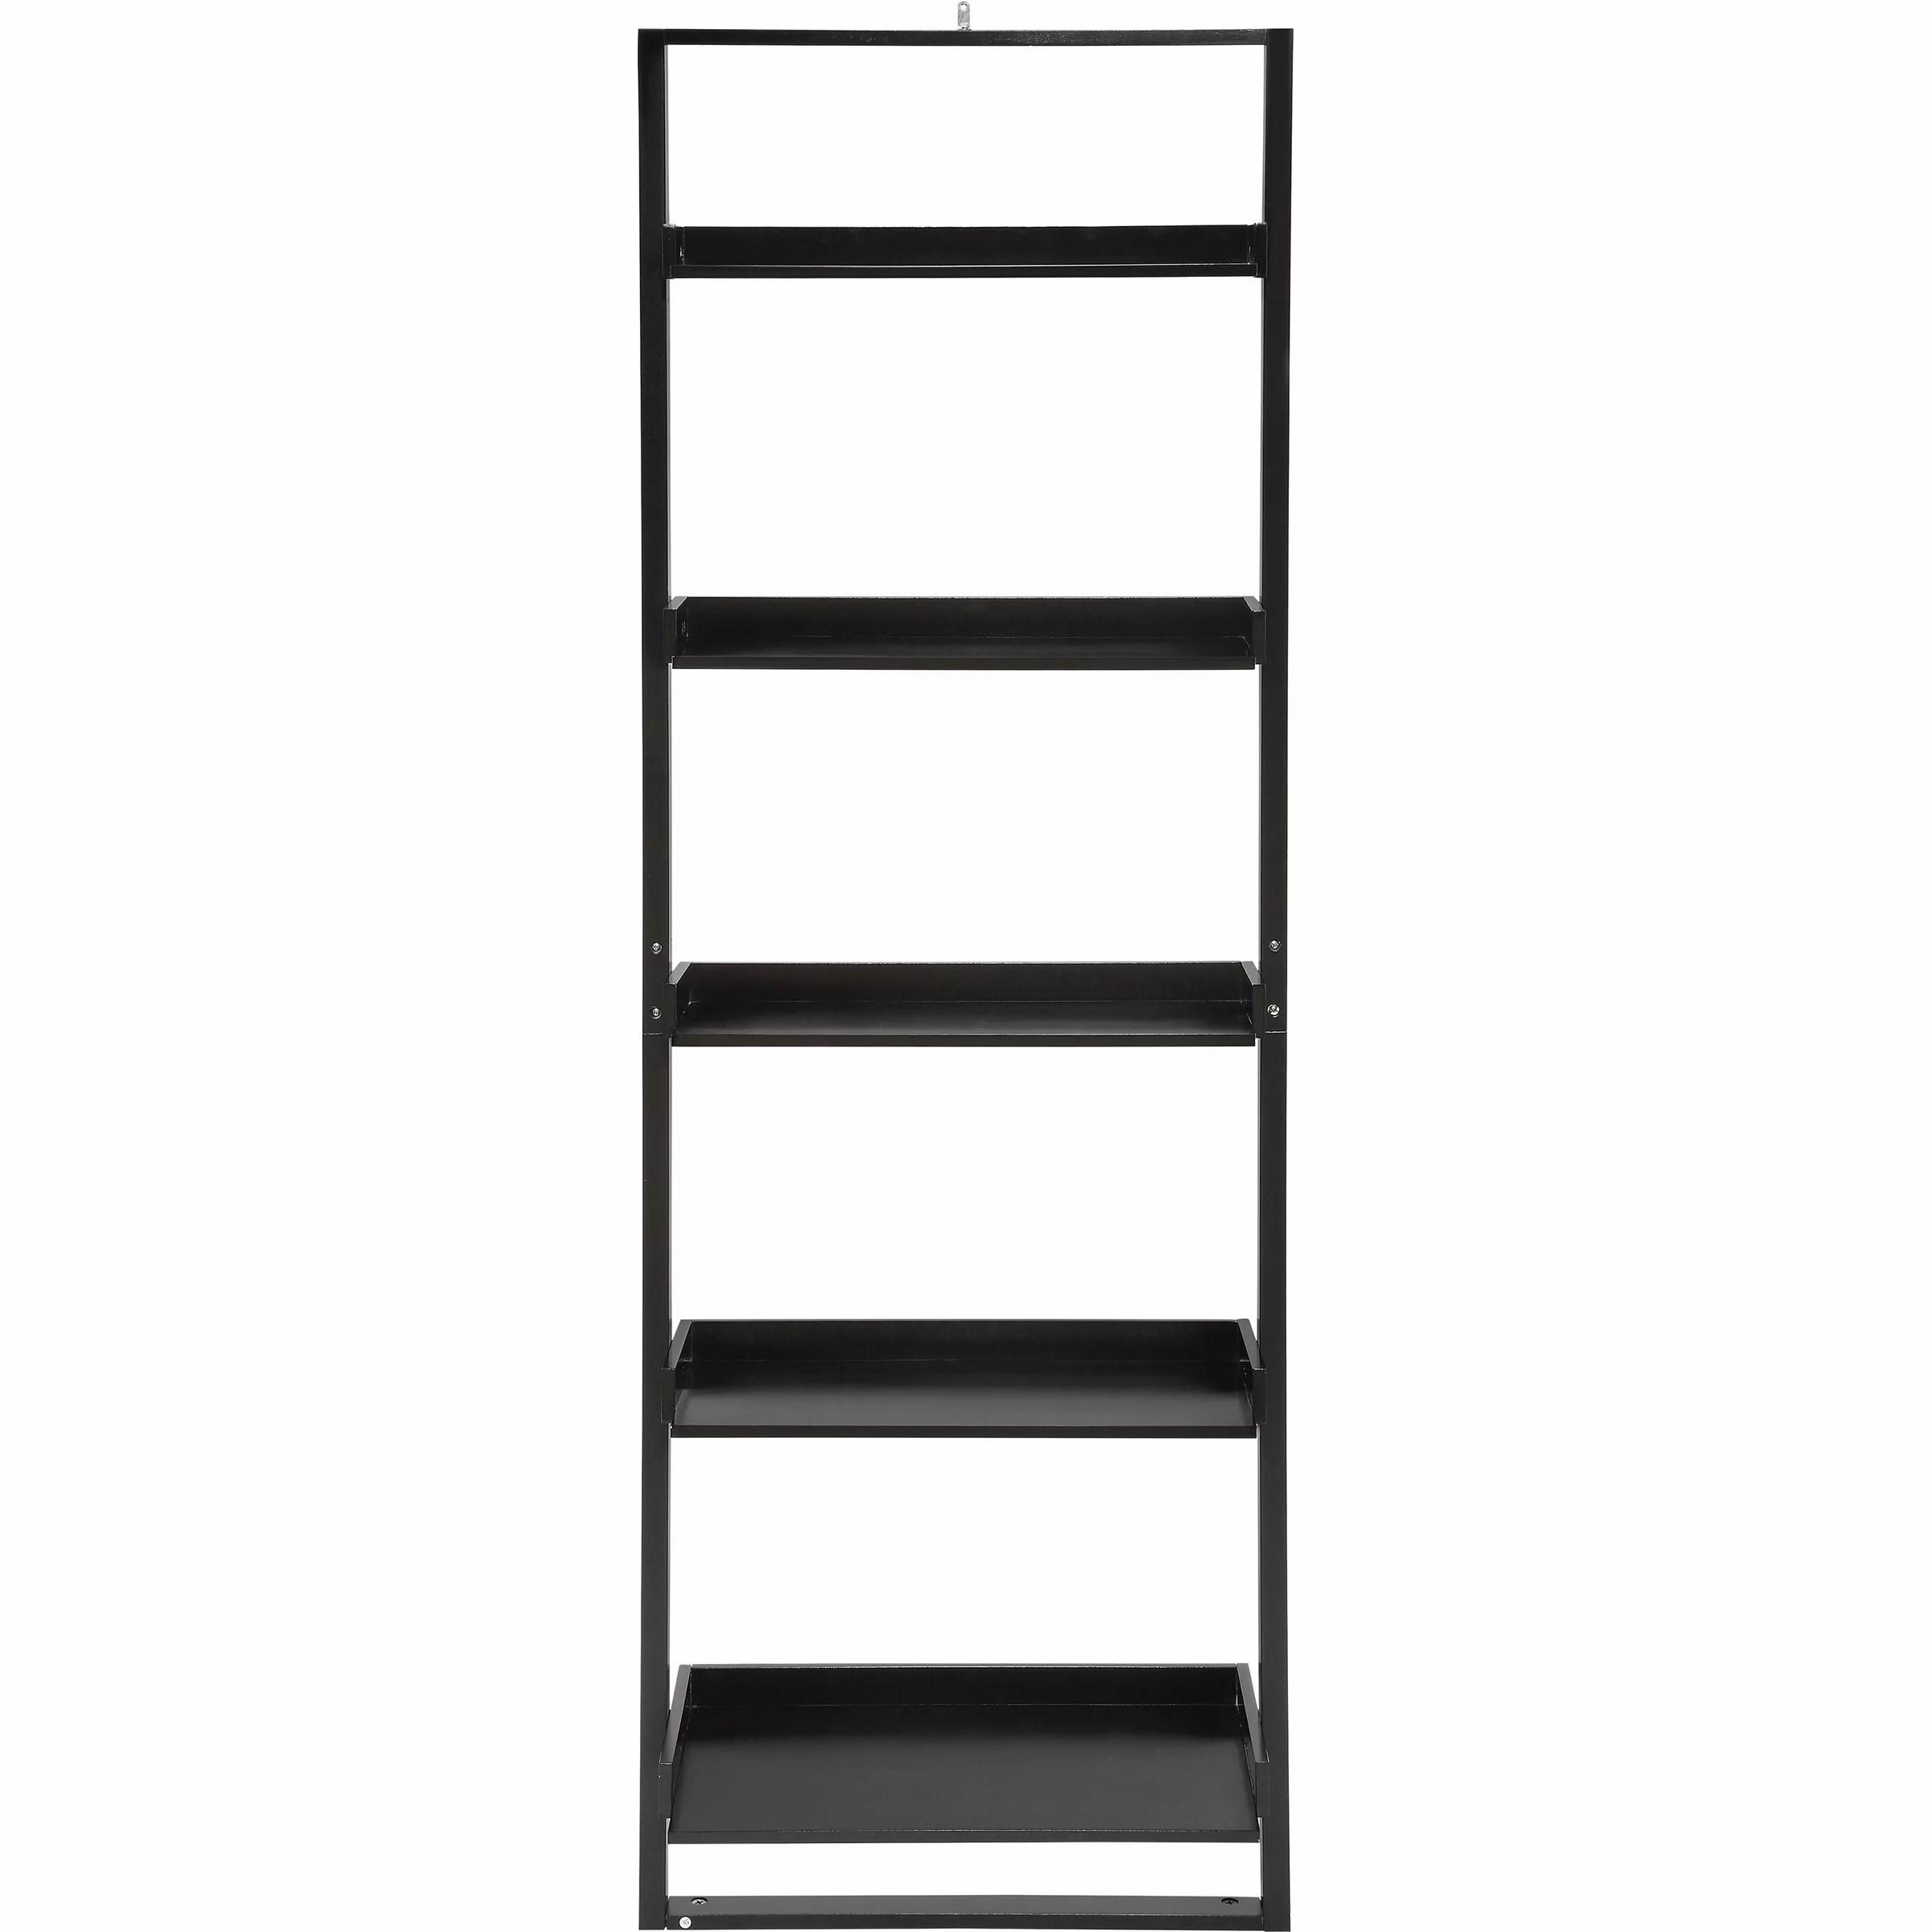 Details About Mainstays 5 Shelf Leaning Ladder Bookcase Espresso